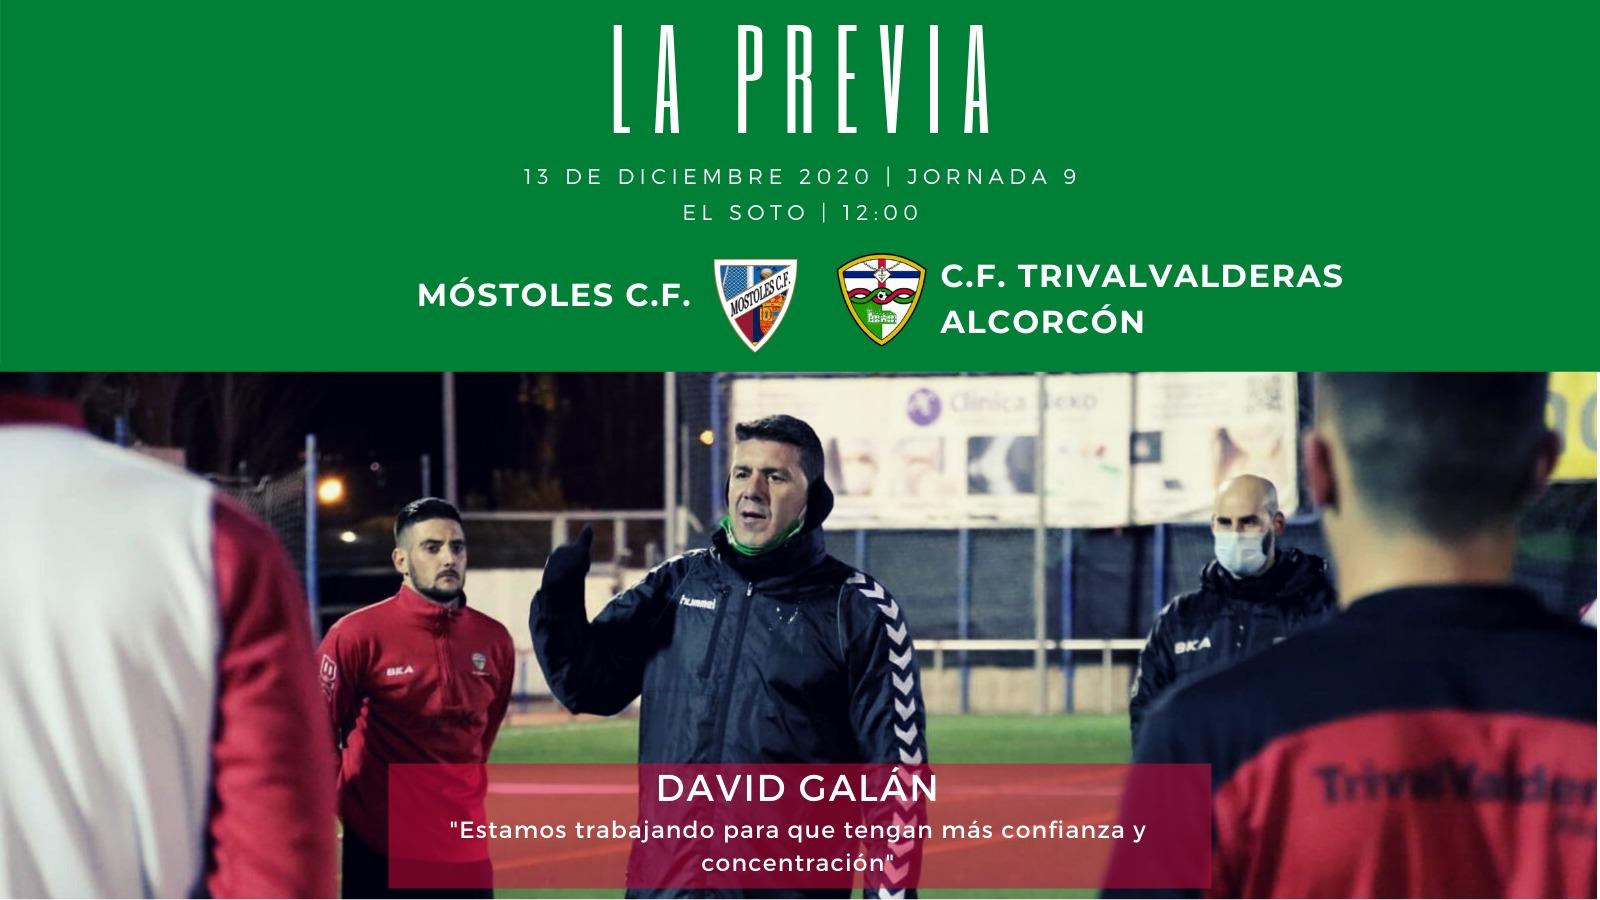 PREVIA J9 |Móstoles C.F. - C.F. TrivalValderas Alcorcón